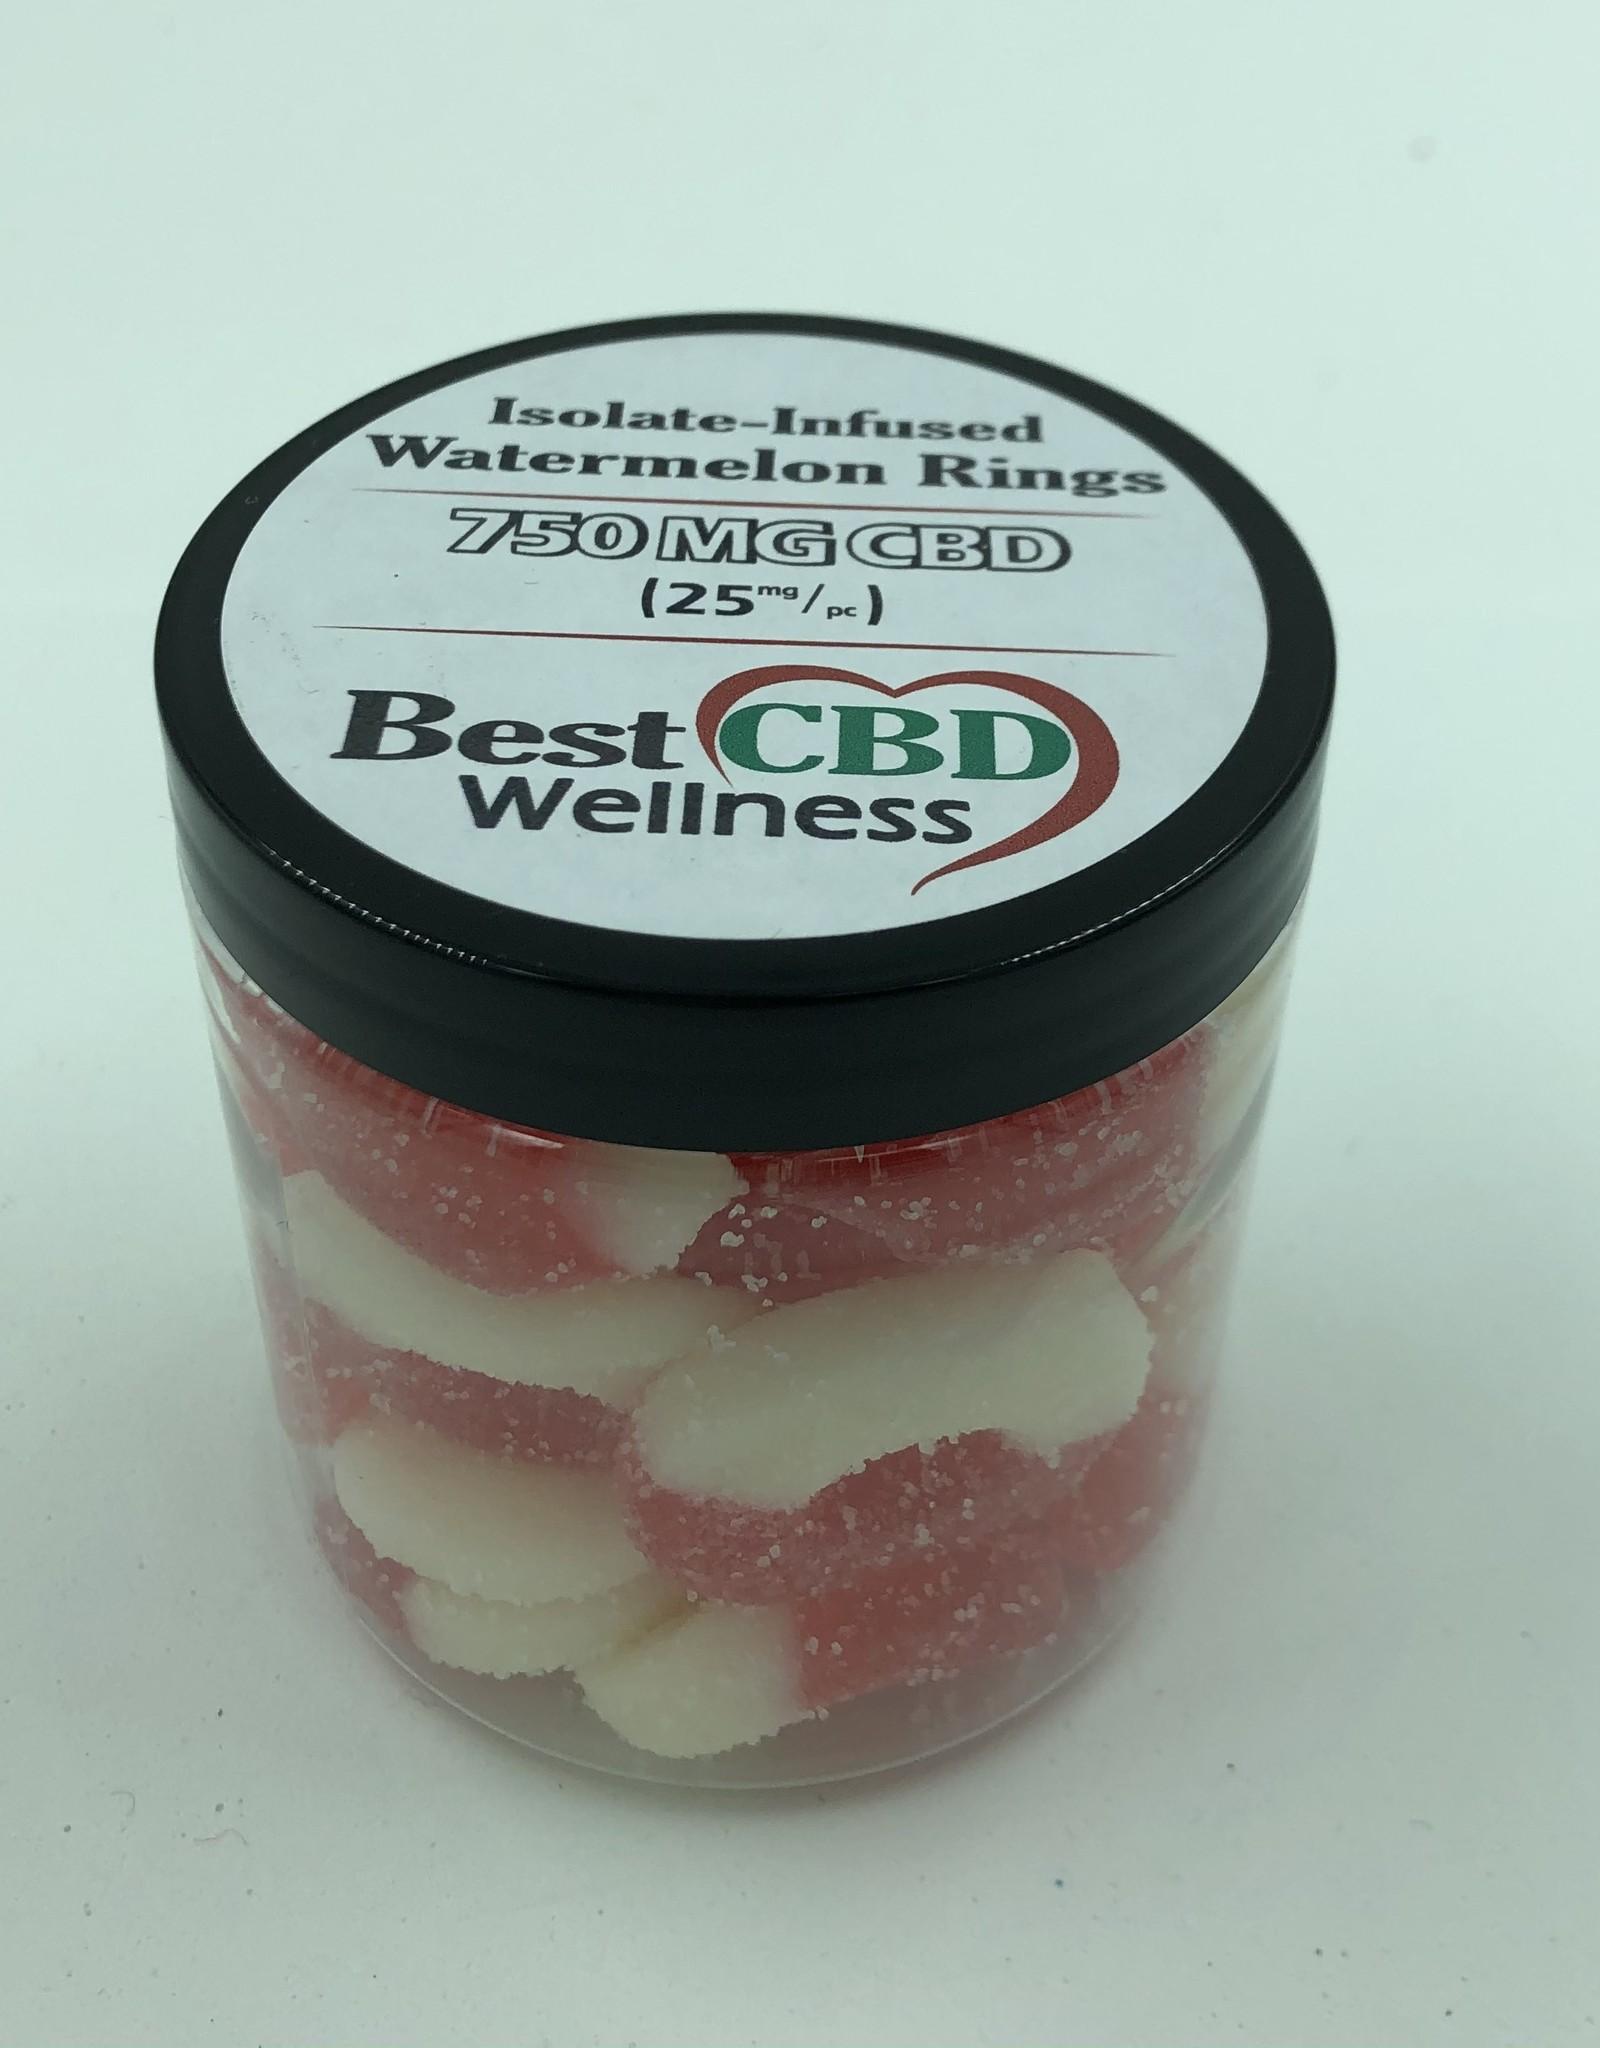 Best CBD Wellness Isolate CBD Watermelon Rings 750mg  30 pc / 25mg ea